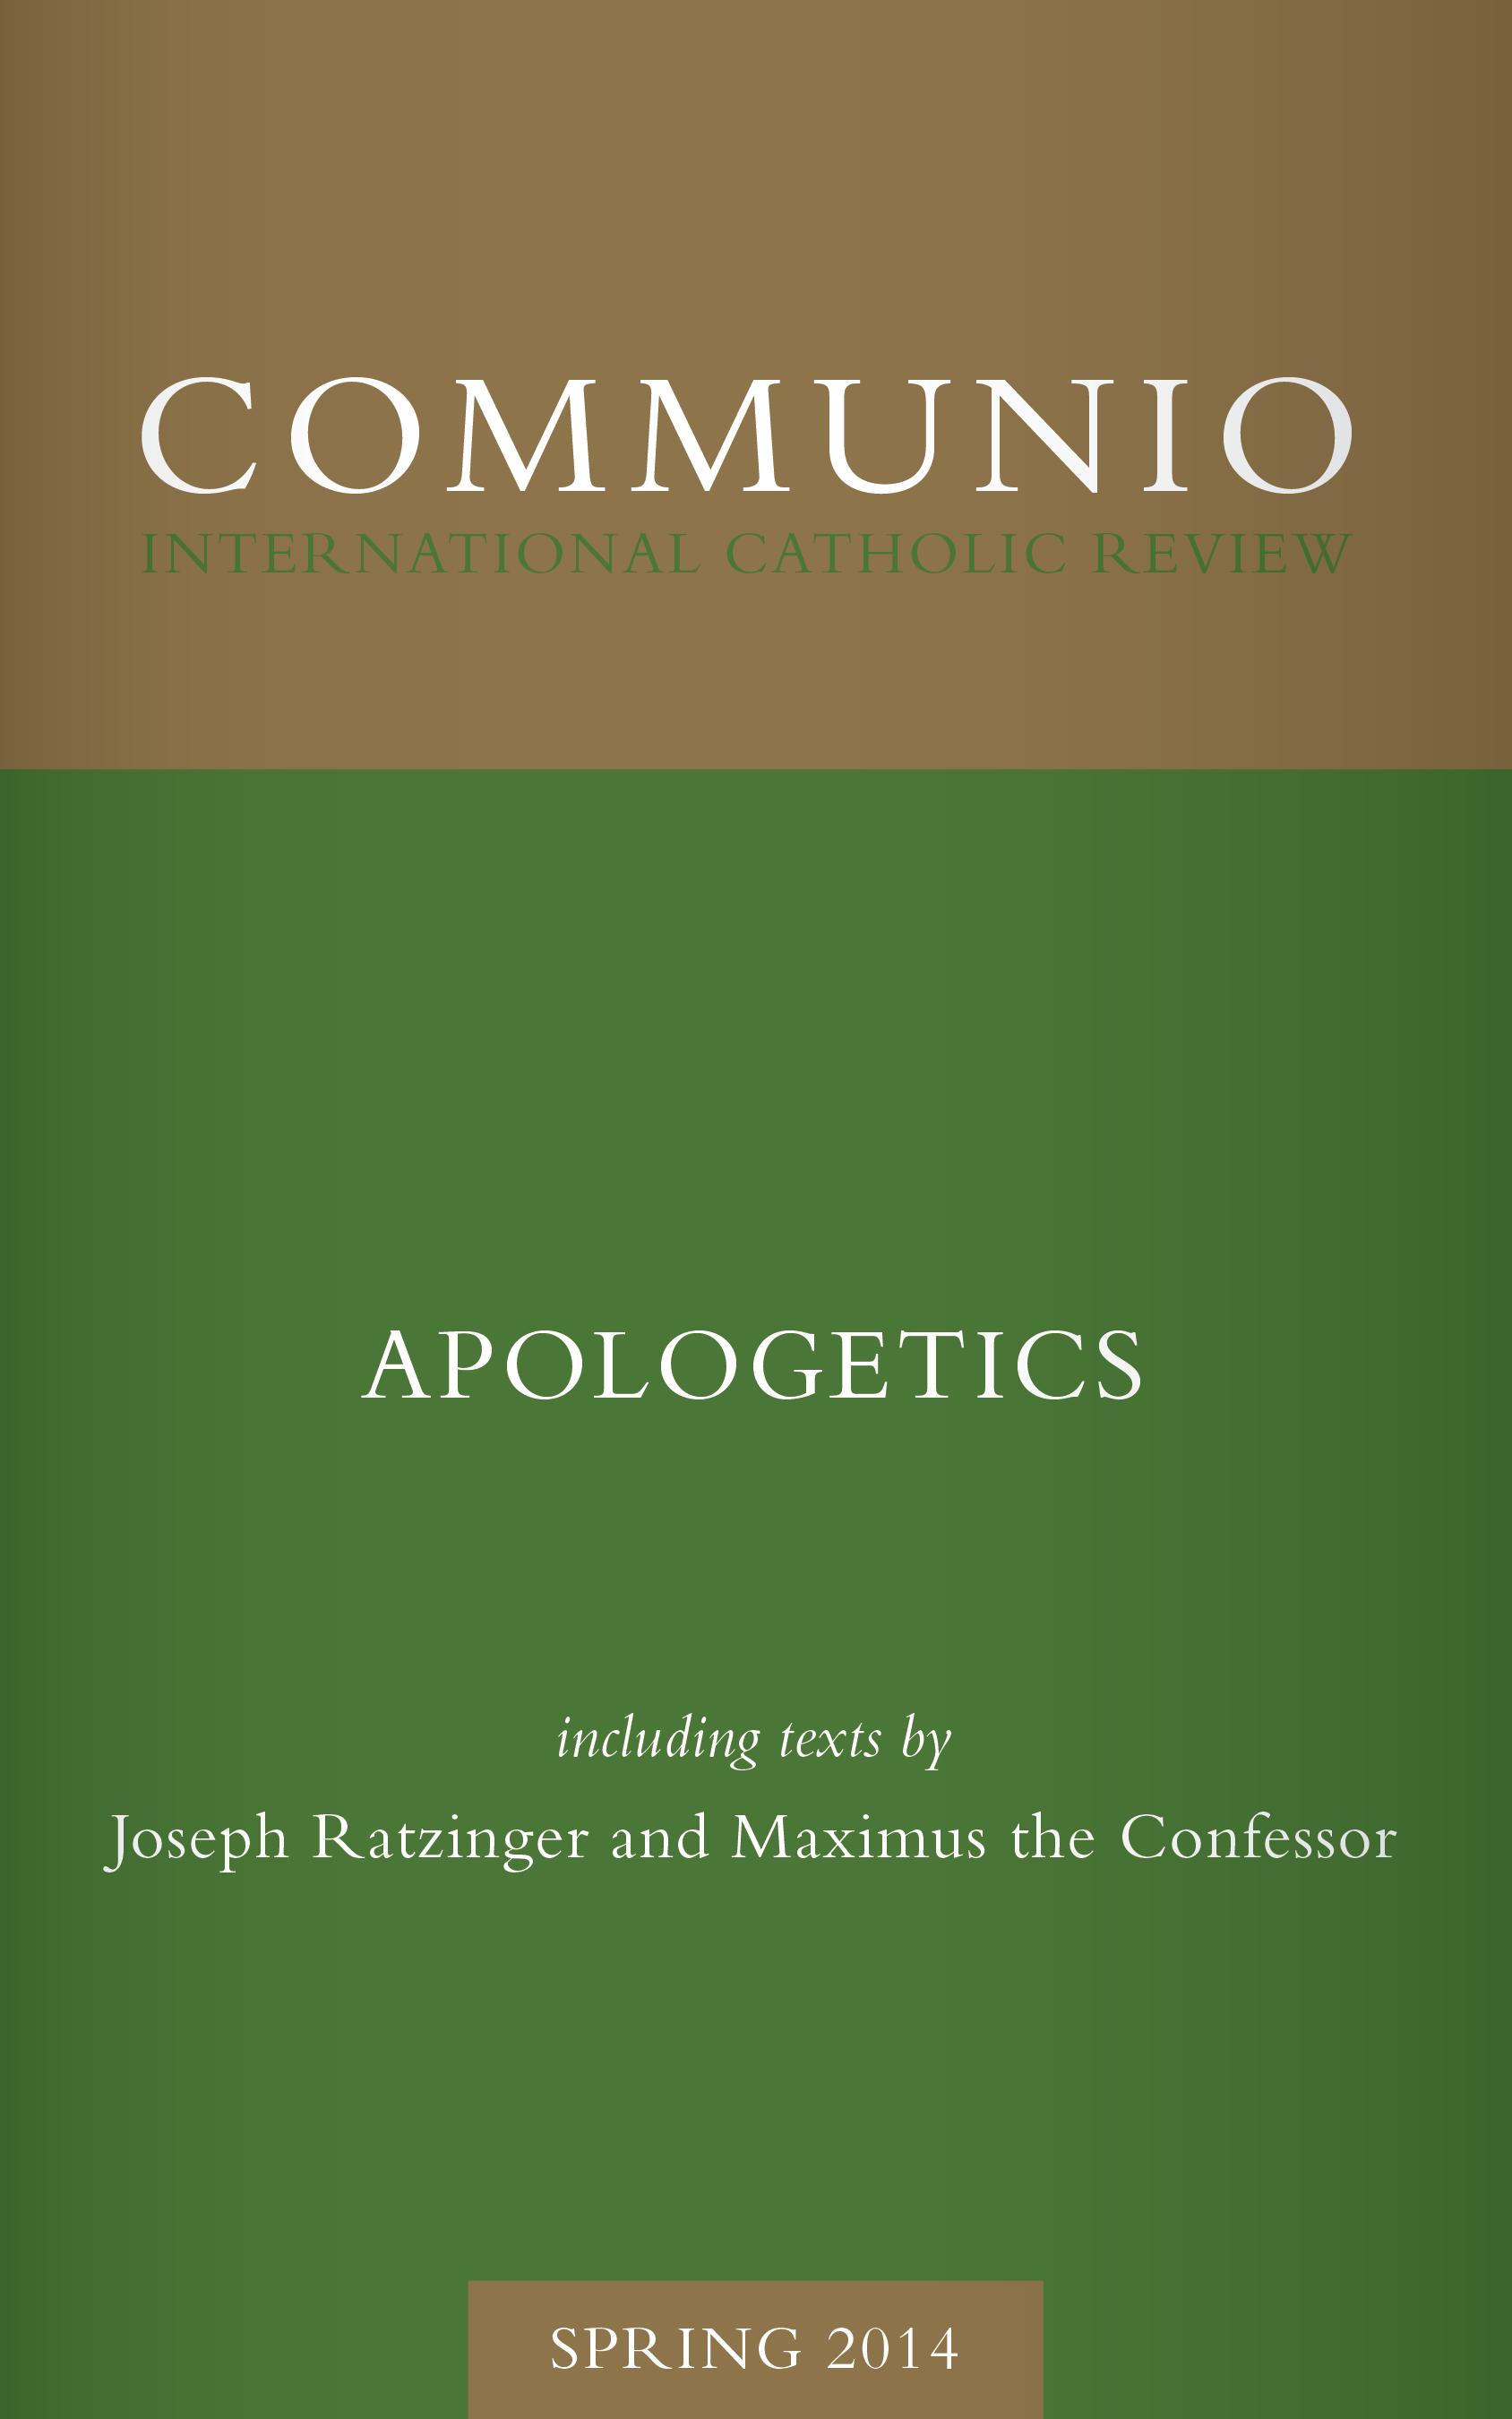 Communio - Spring 2014 - Apologetics (Photocopy)